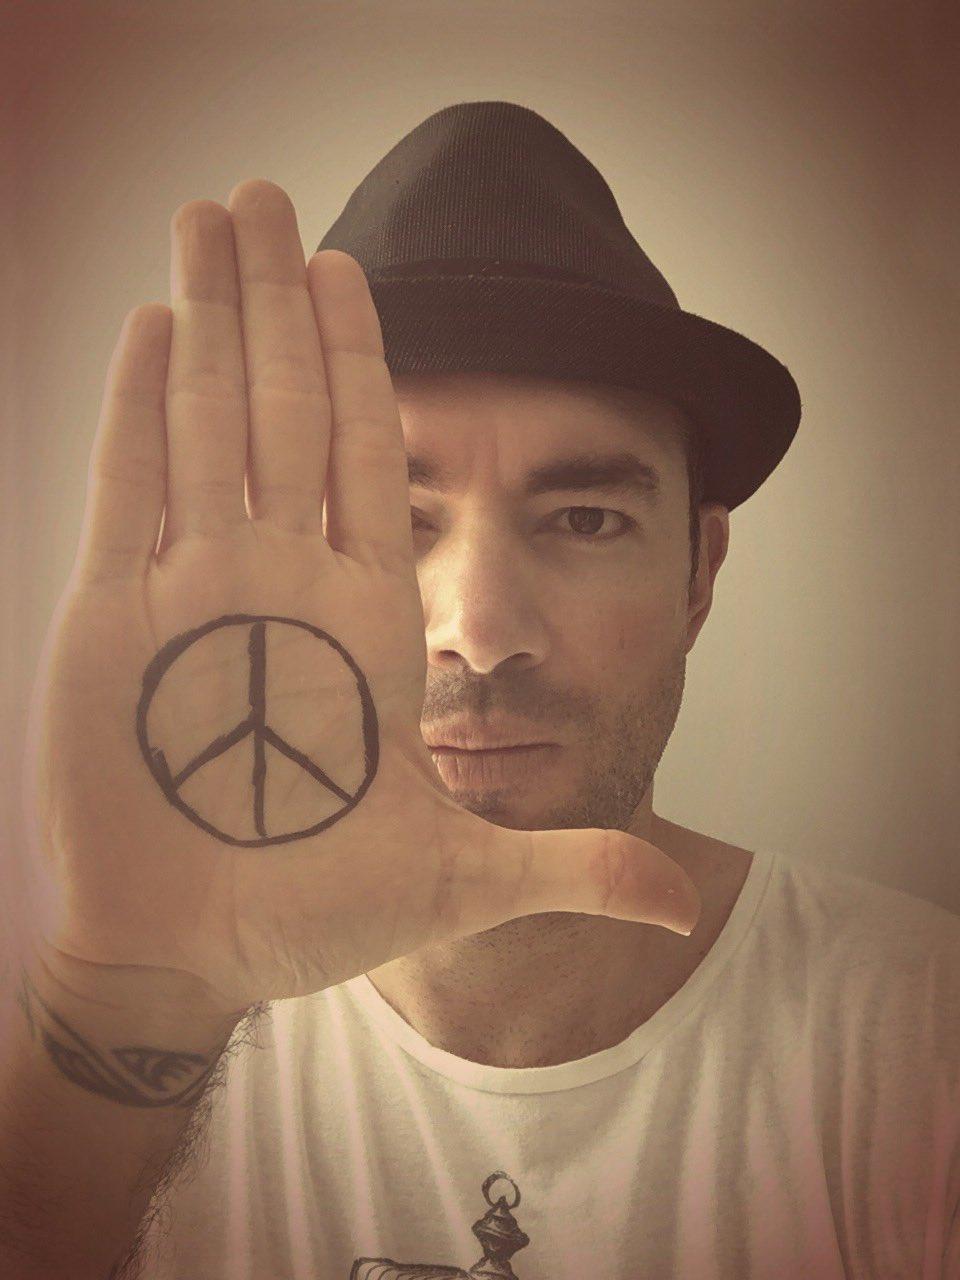 #Peace4Colombia 🇨🇴 https://t.co/7zoO4D8Dpz